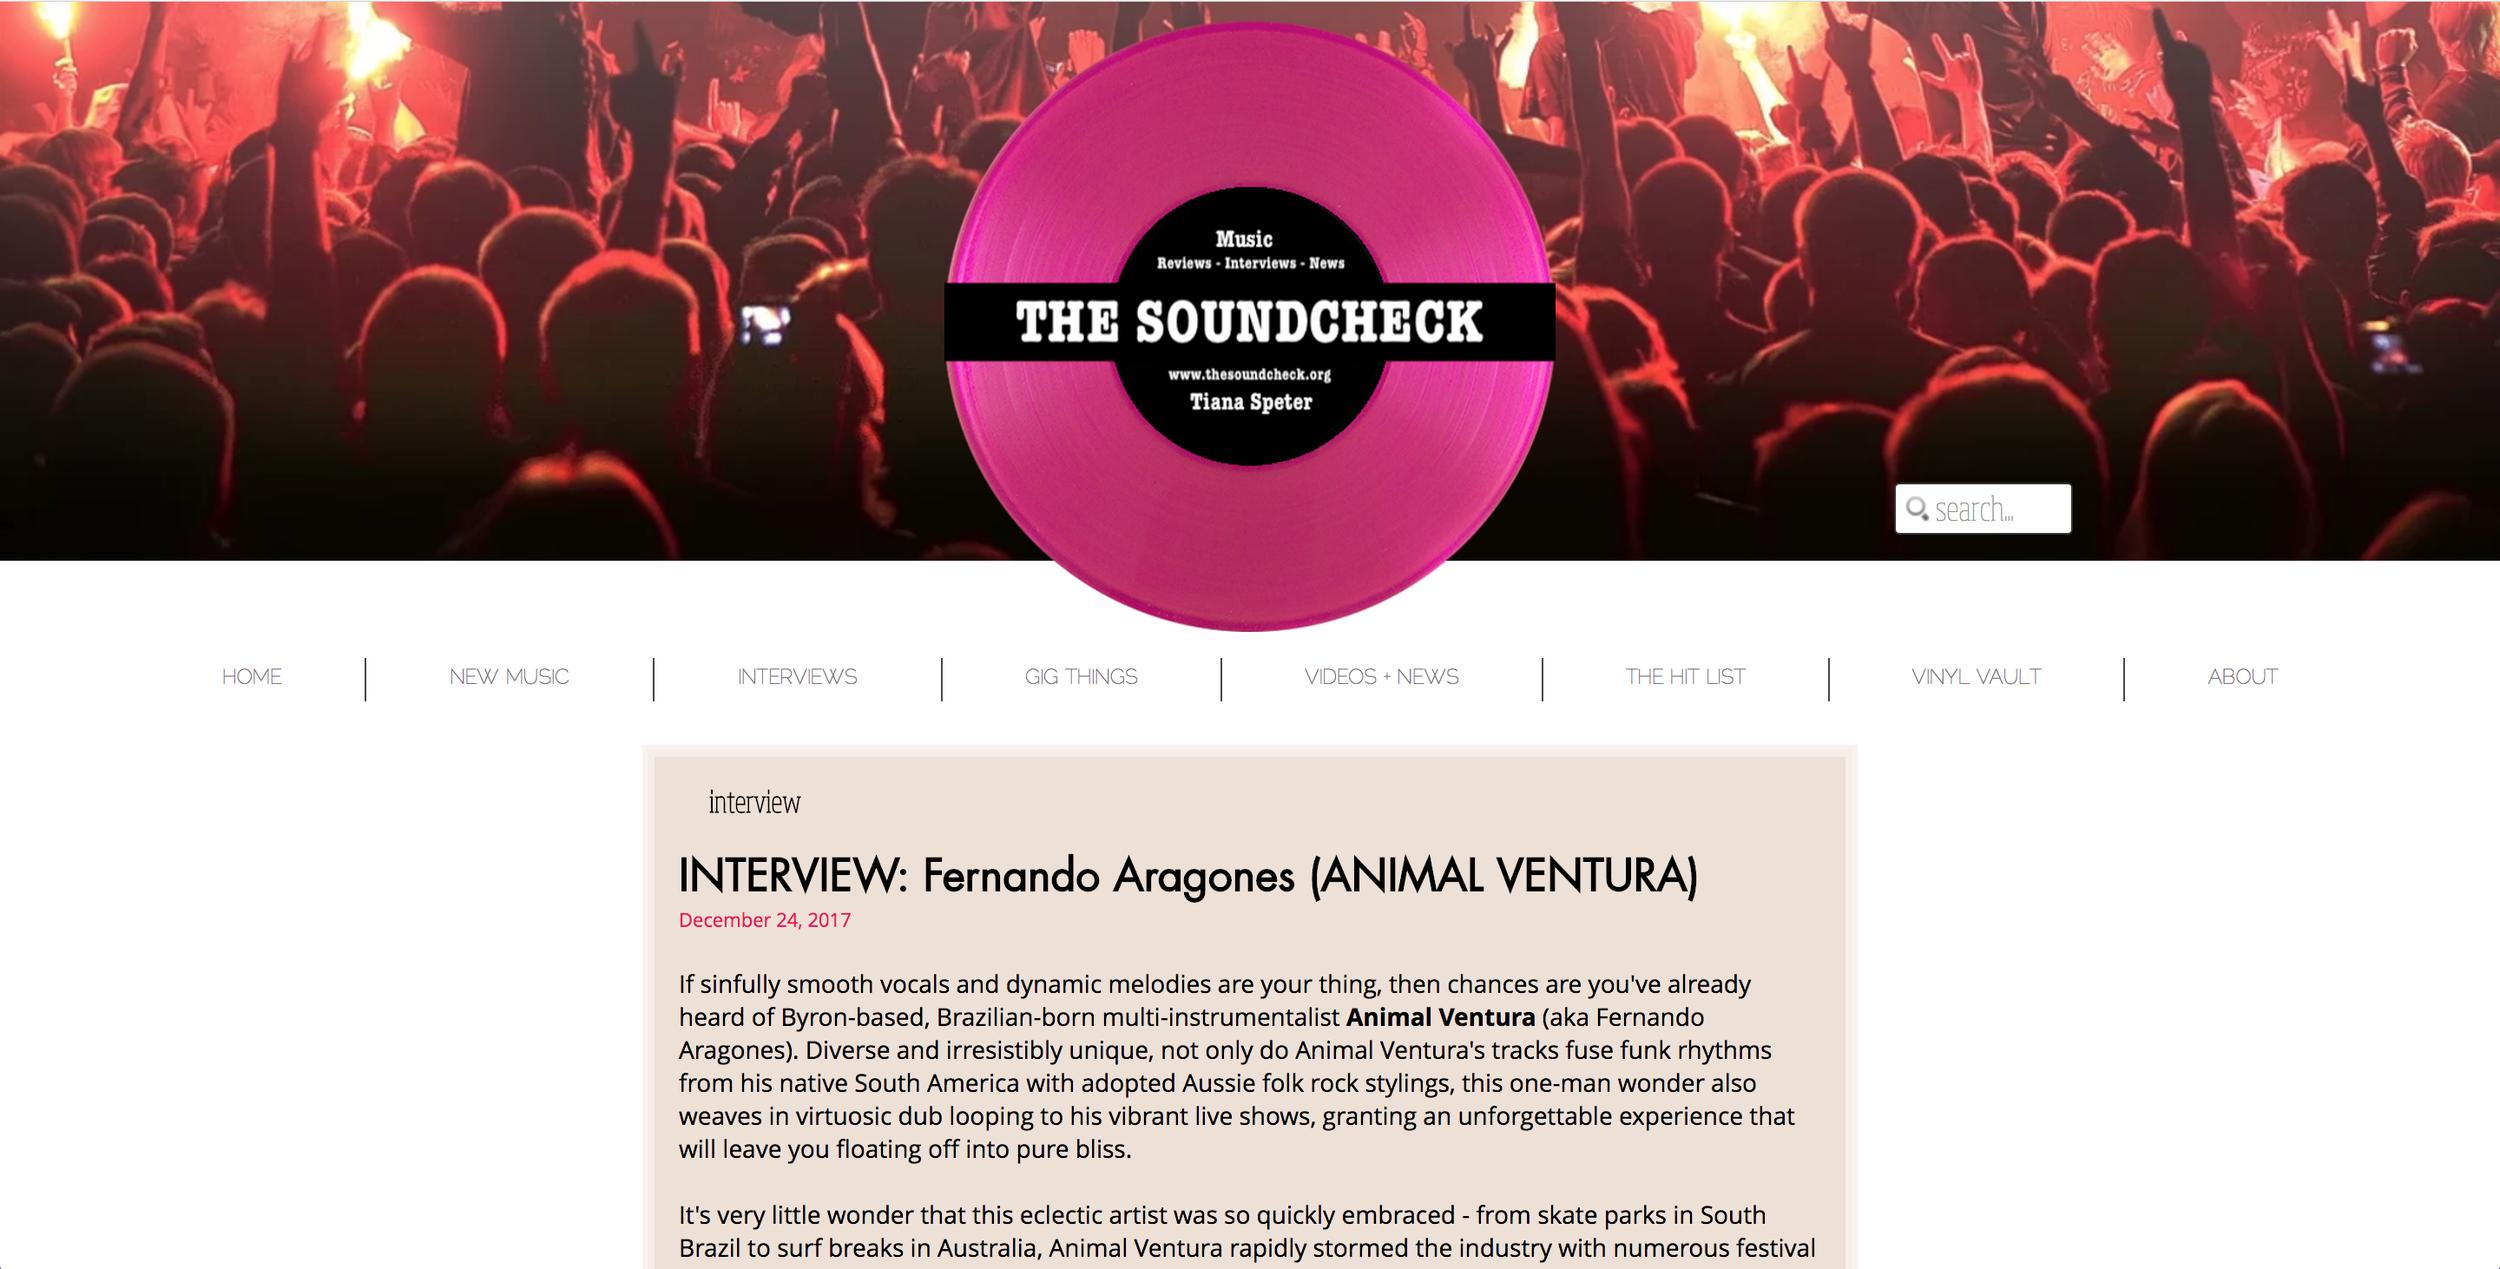 https://www.thesoundcheck.org/single-post/INTERVIEW-ANIMAL-VENTURA